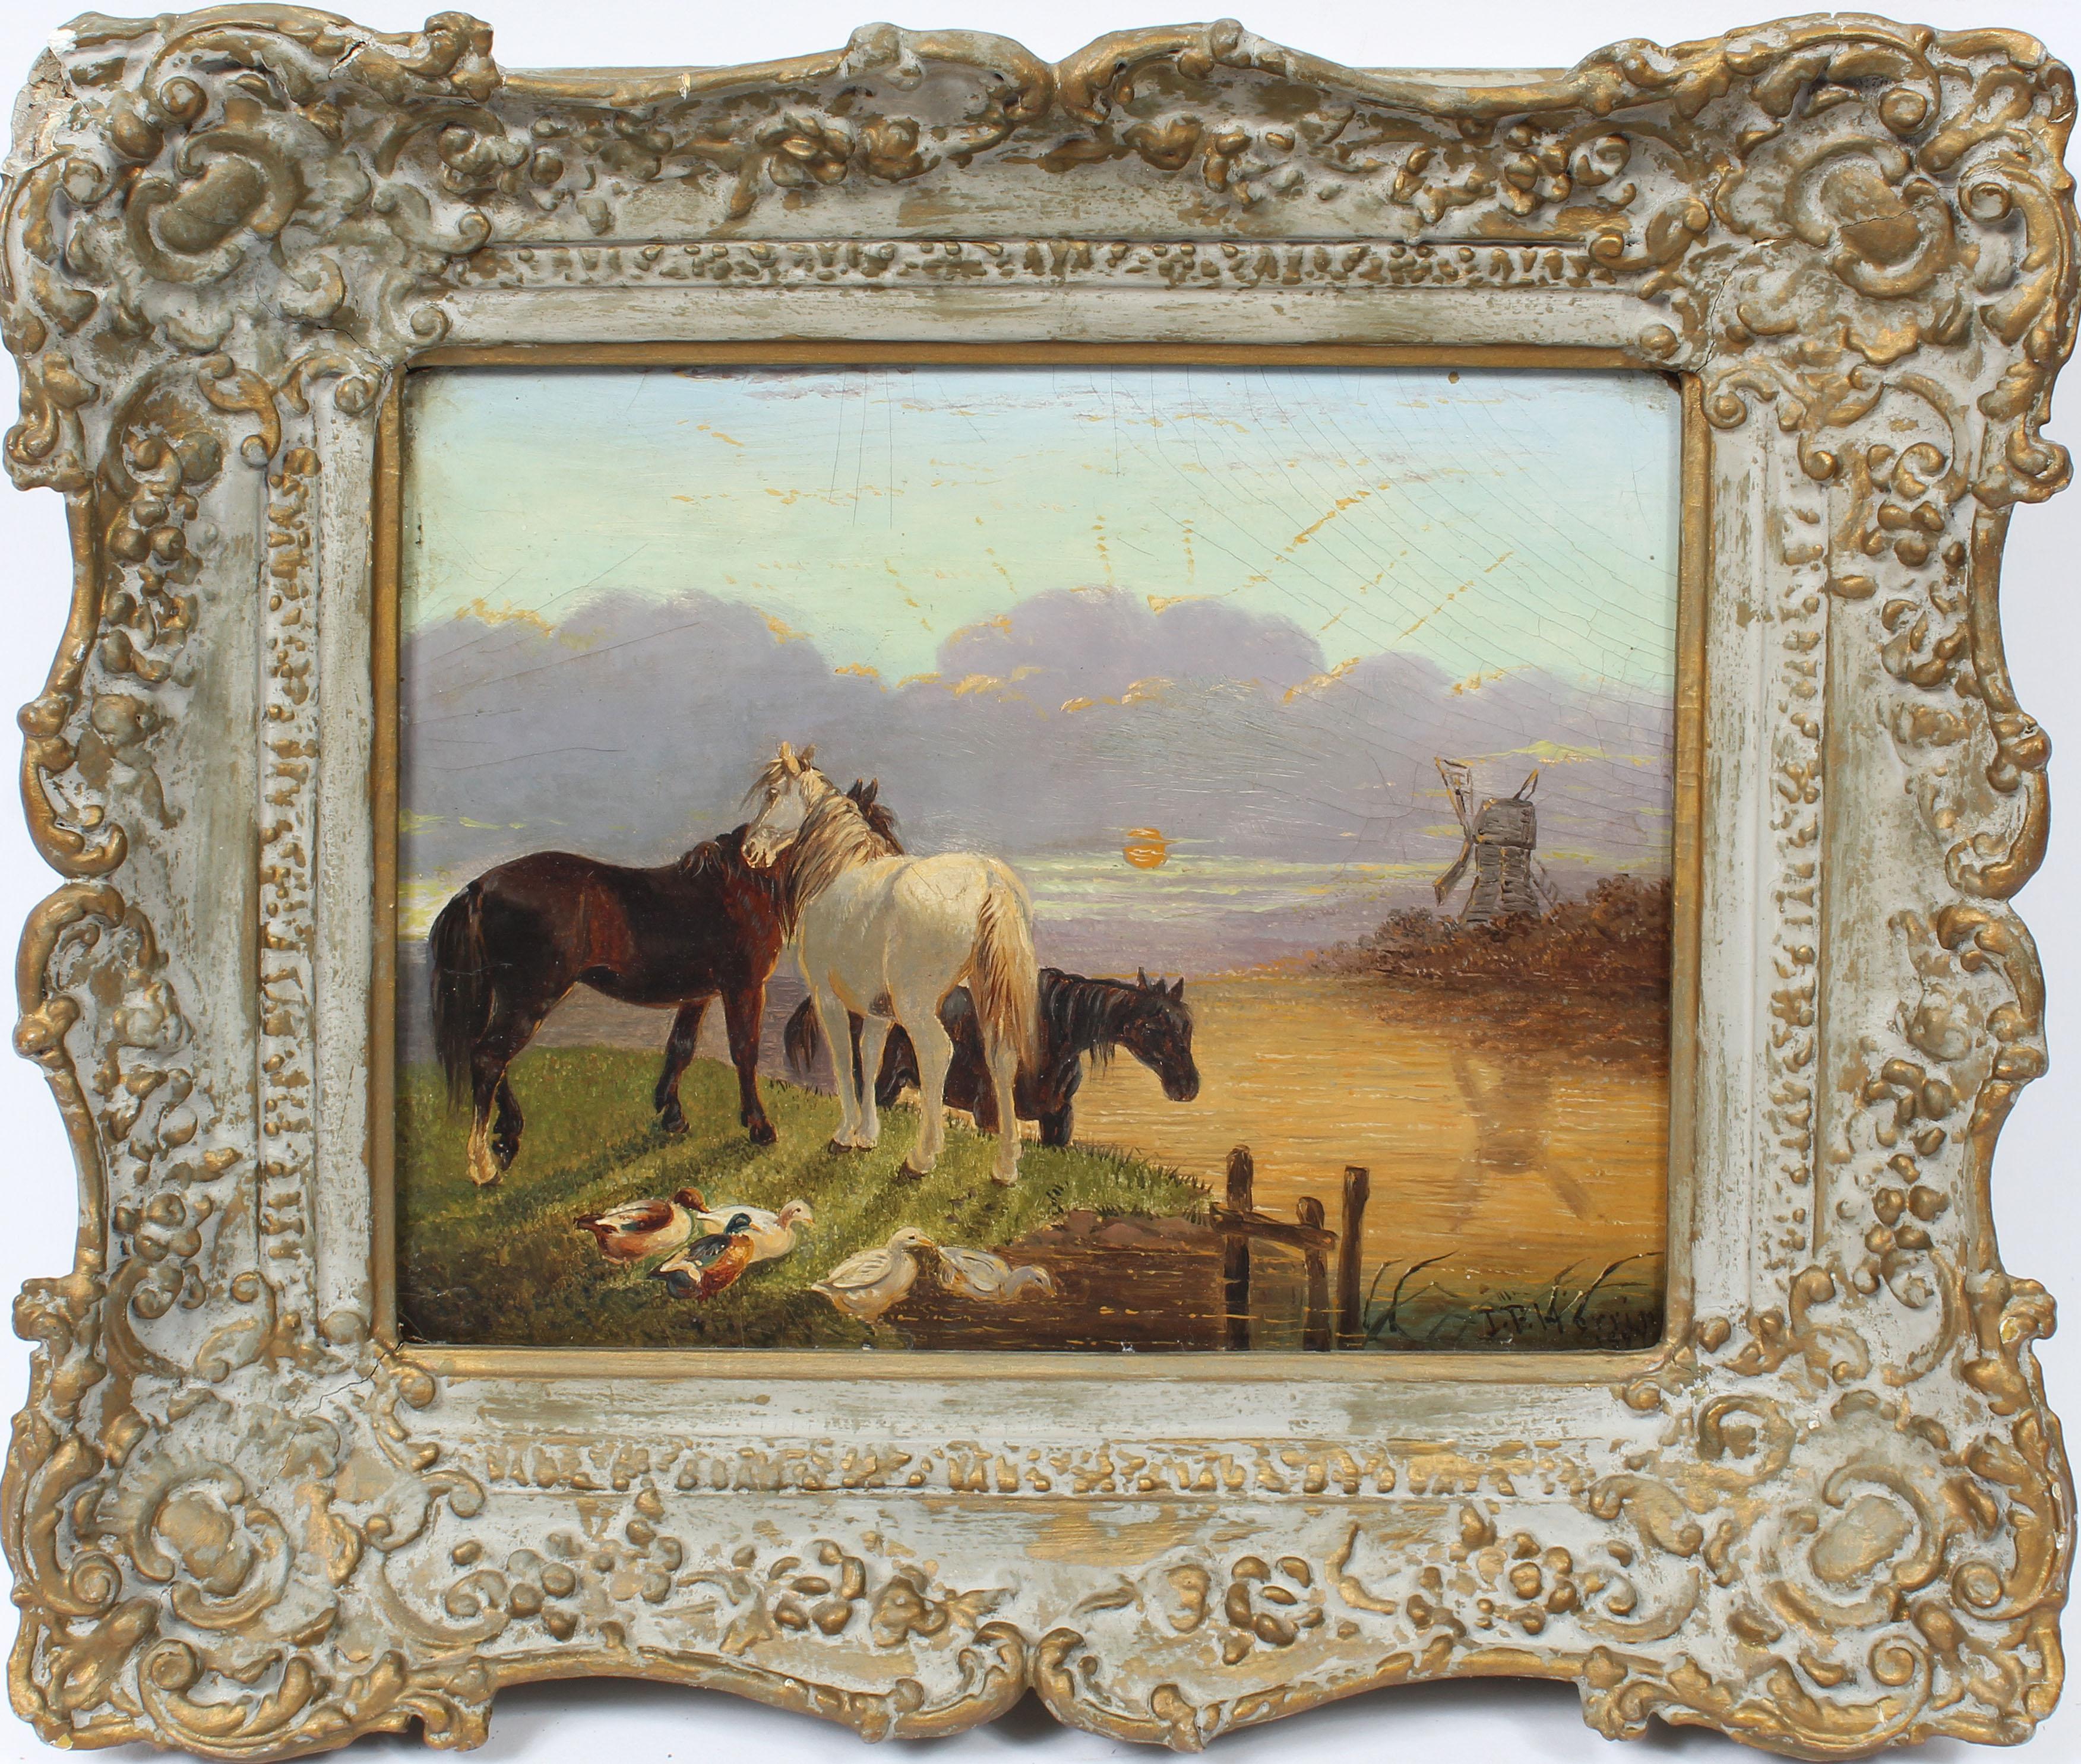 Antique English Sporting Art Animal Horse Portrait Sunset Landscape Oil Painting